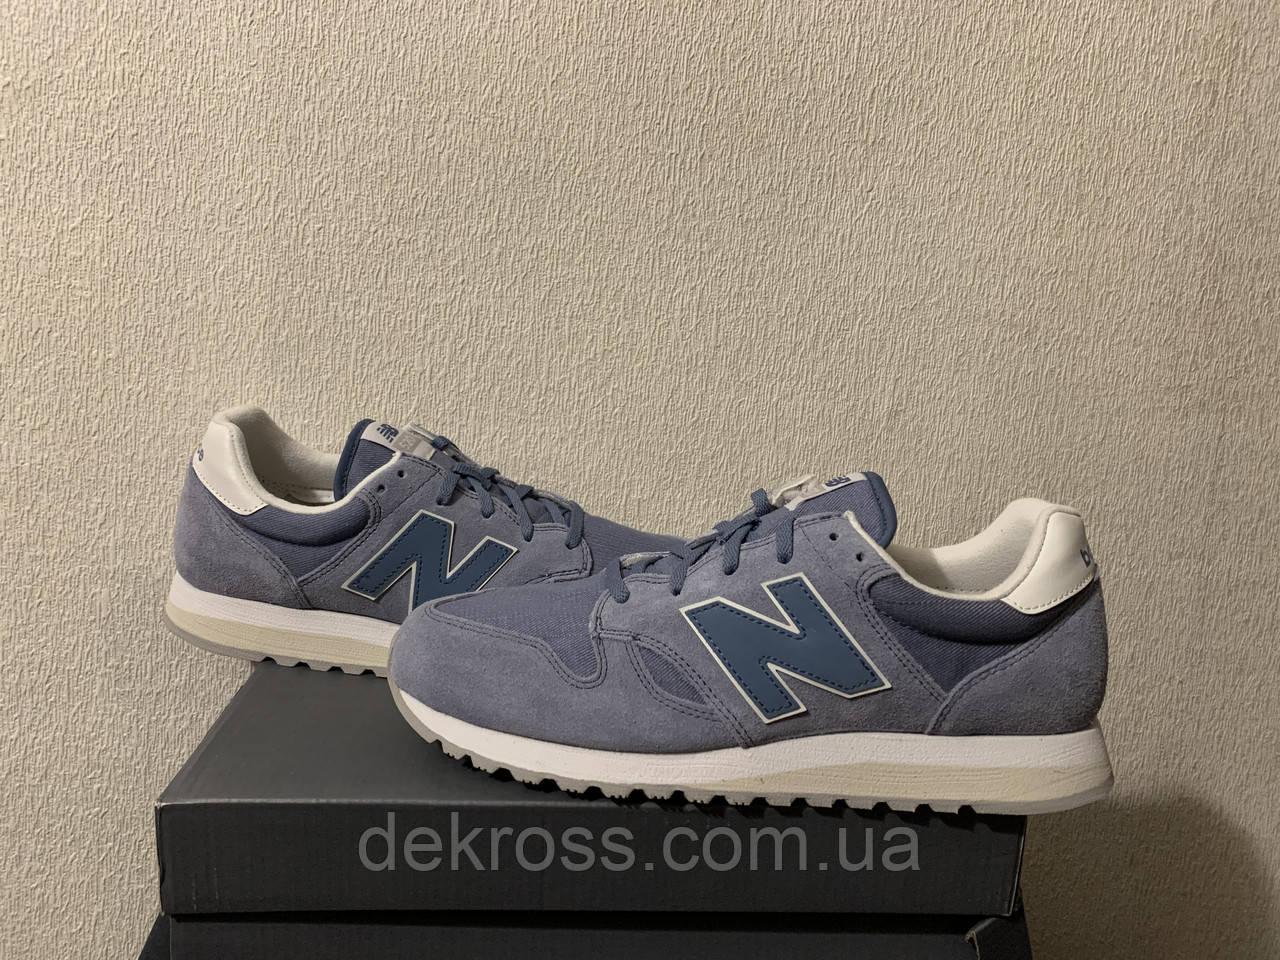 Кроссовки New Balance 520 Deep Porcelain Blue (43) Оригинал WL520CB